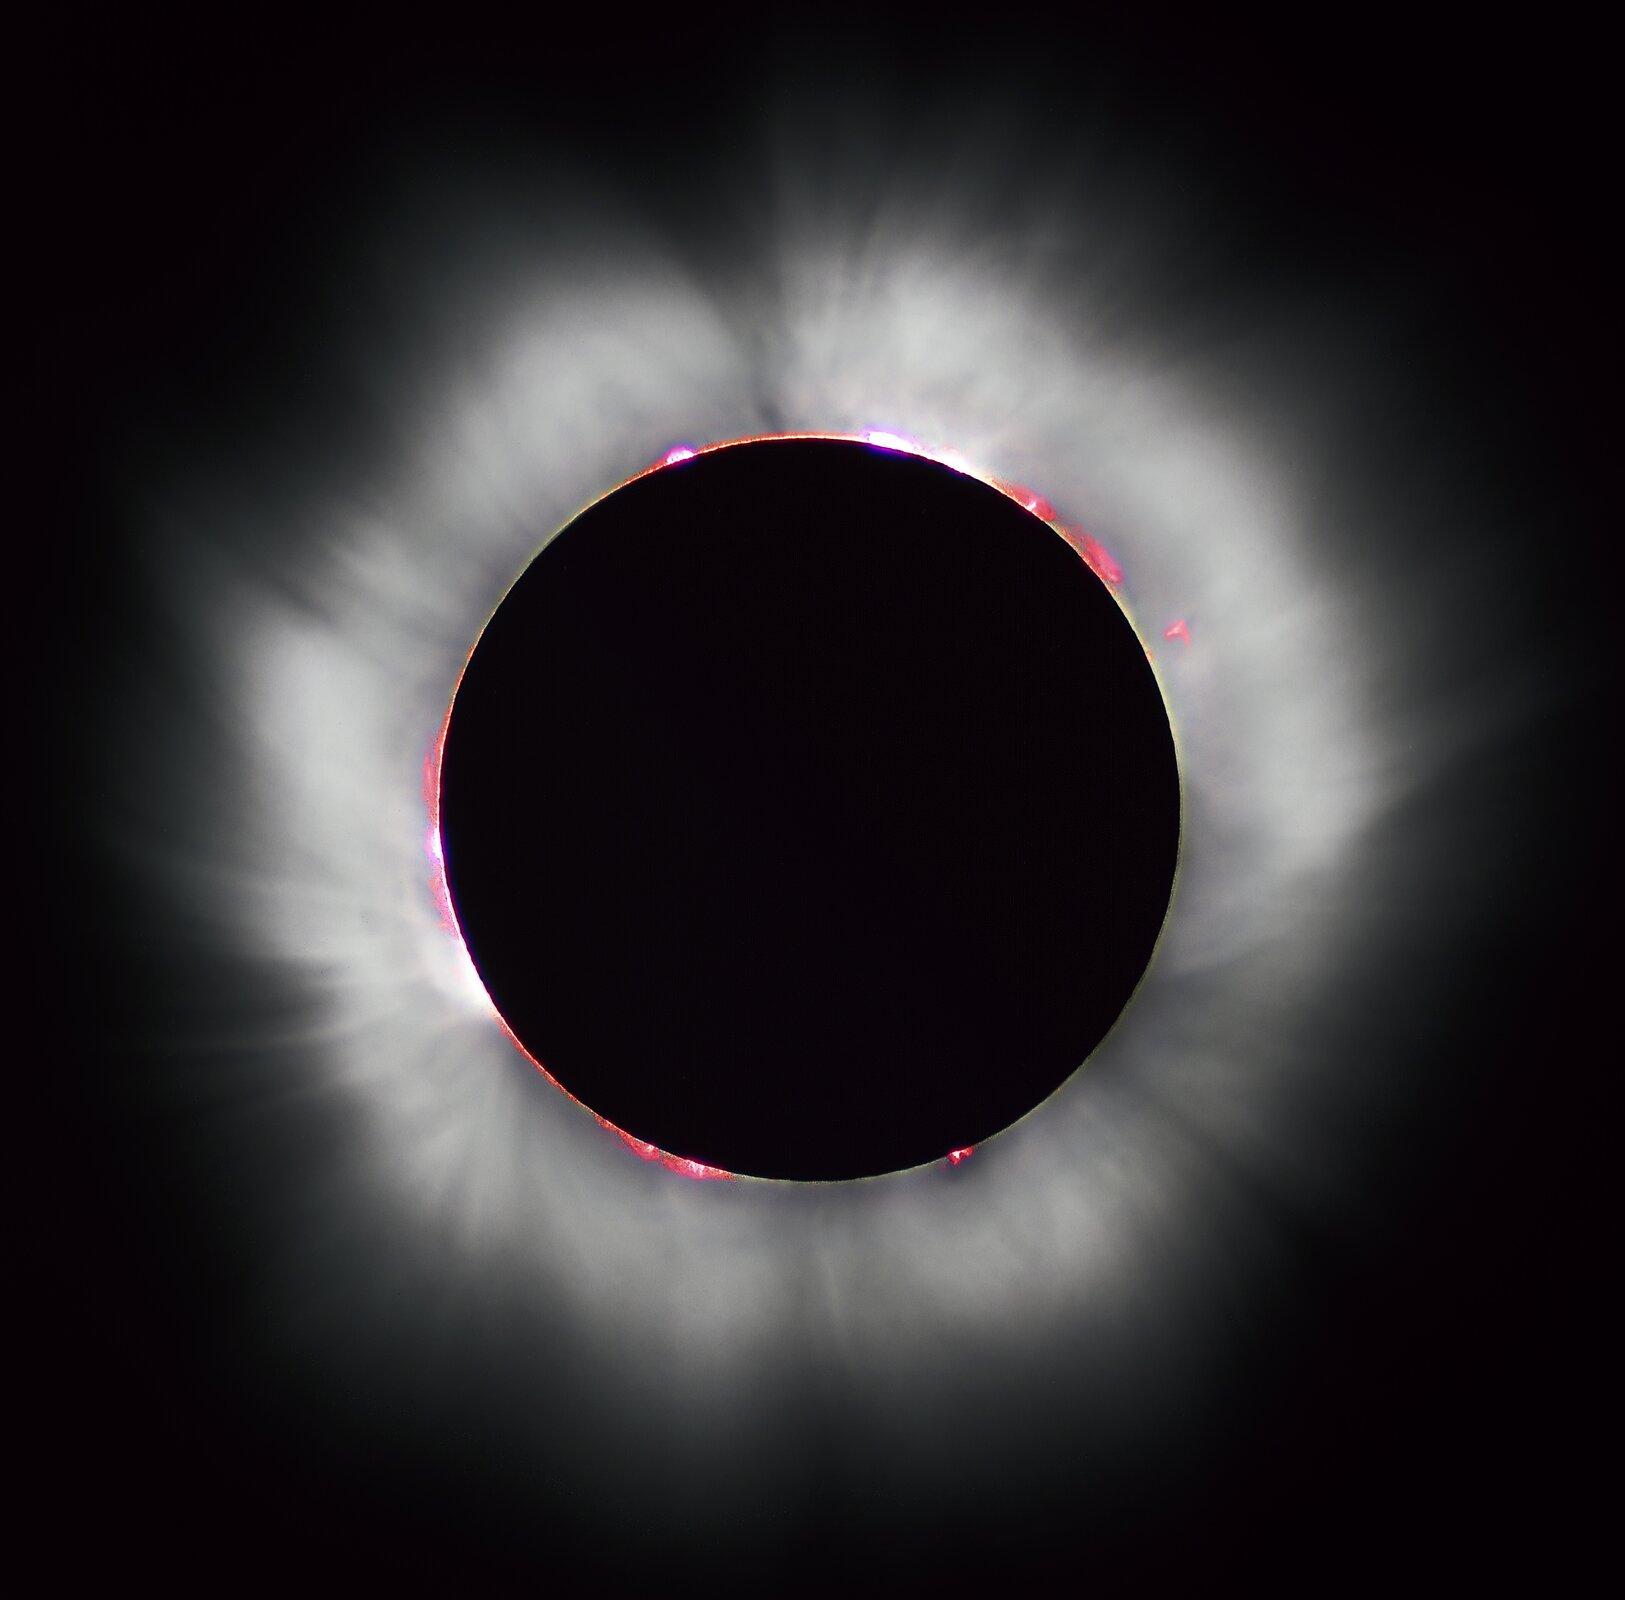 Korona słoneczna